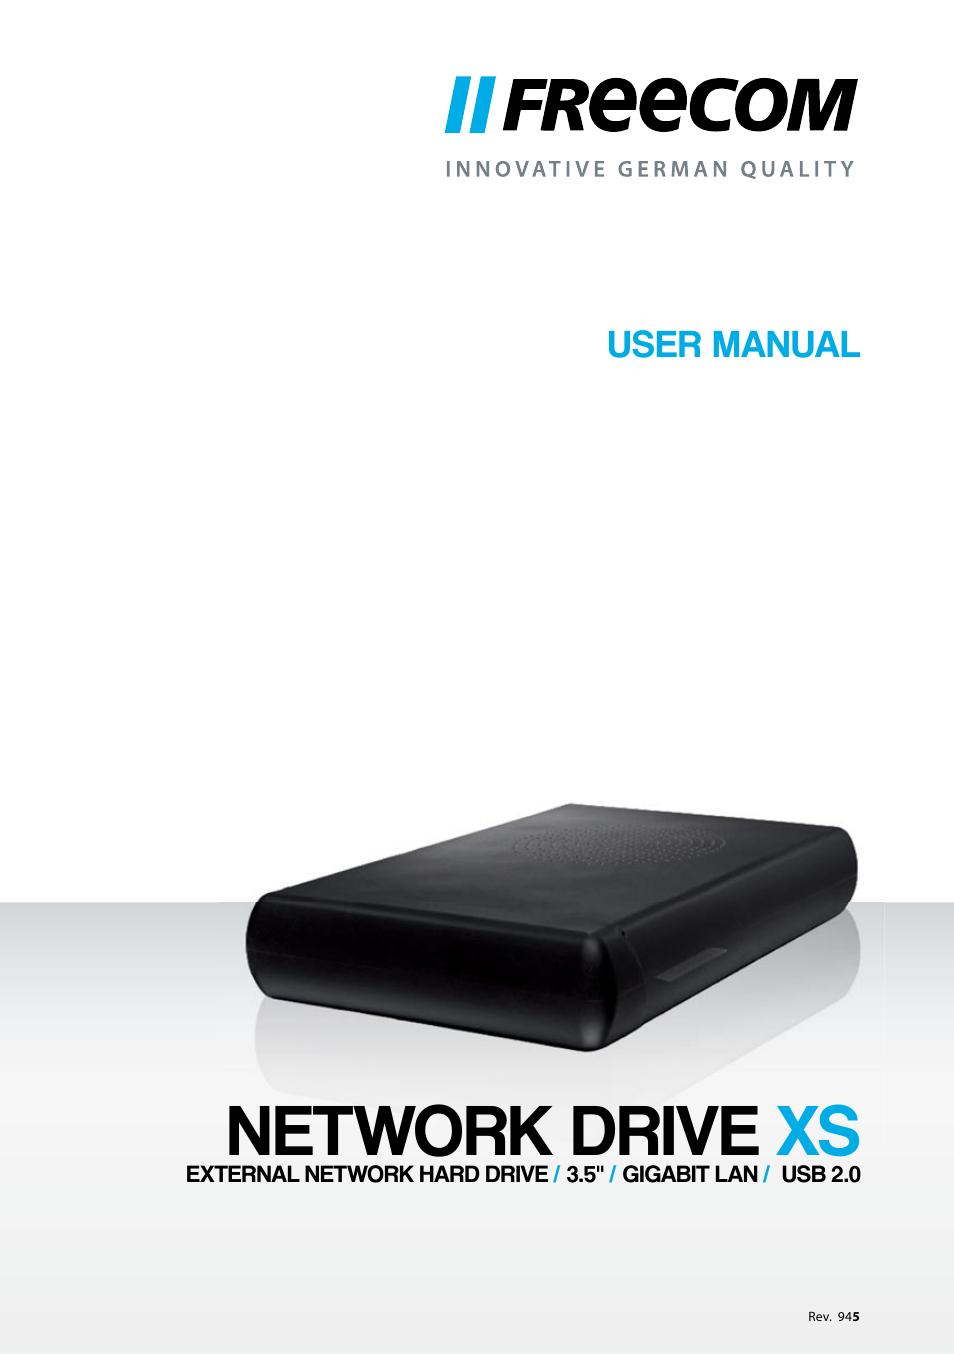 Freecom network drive pro 500gb youtube.